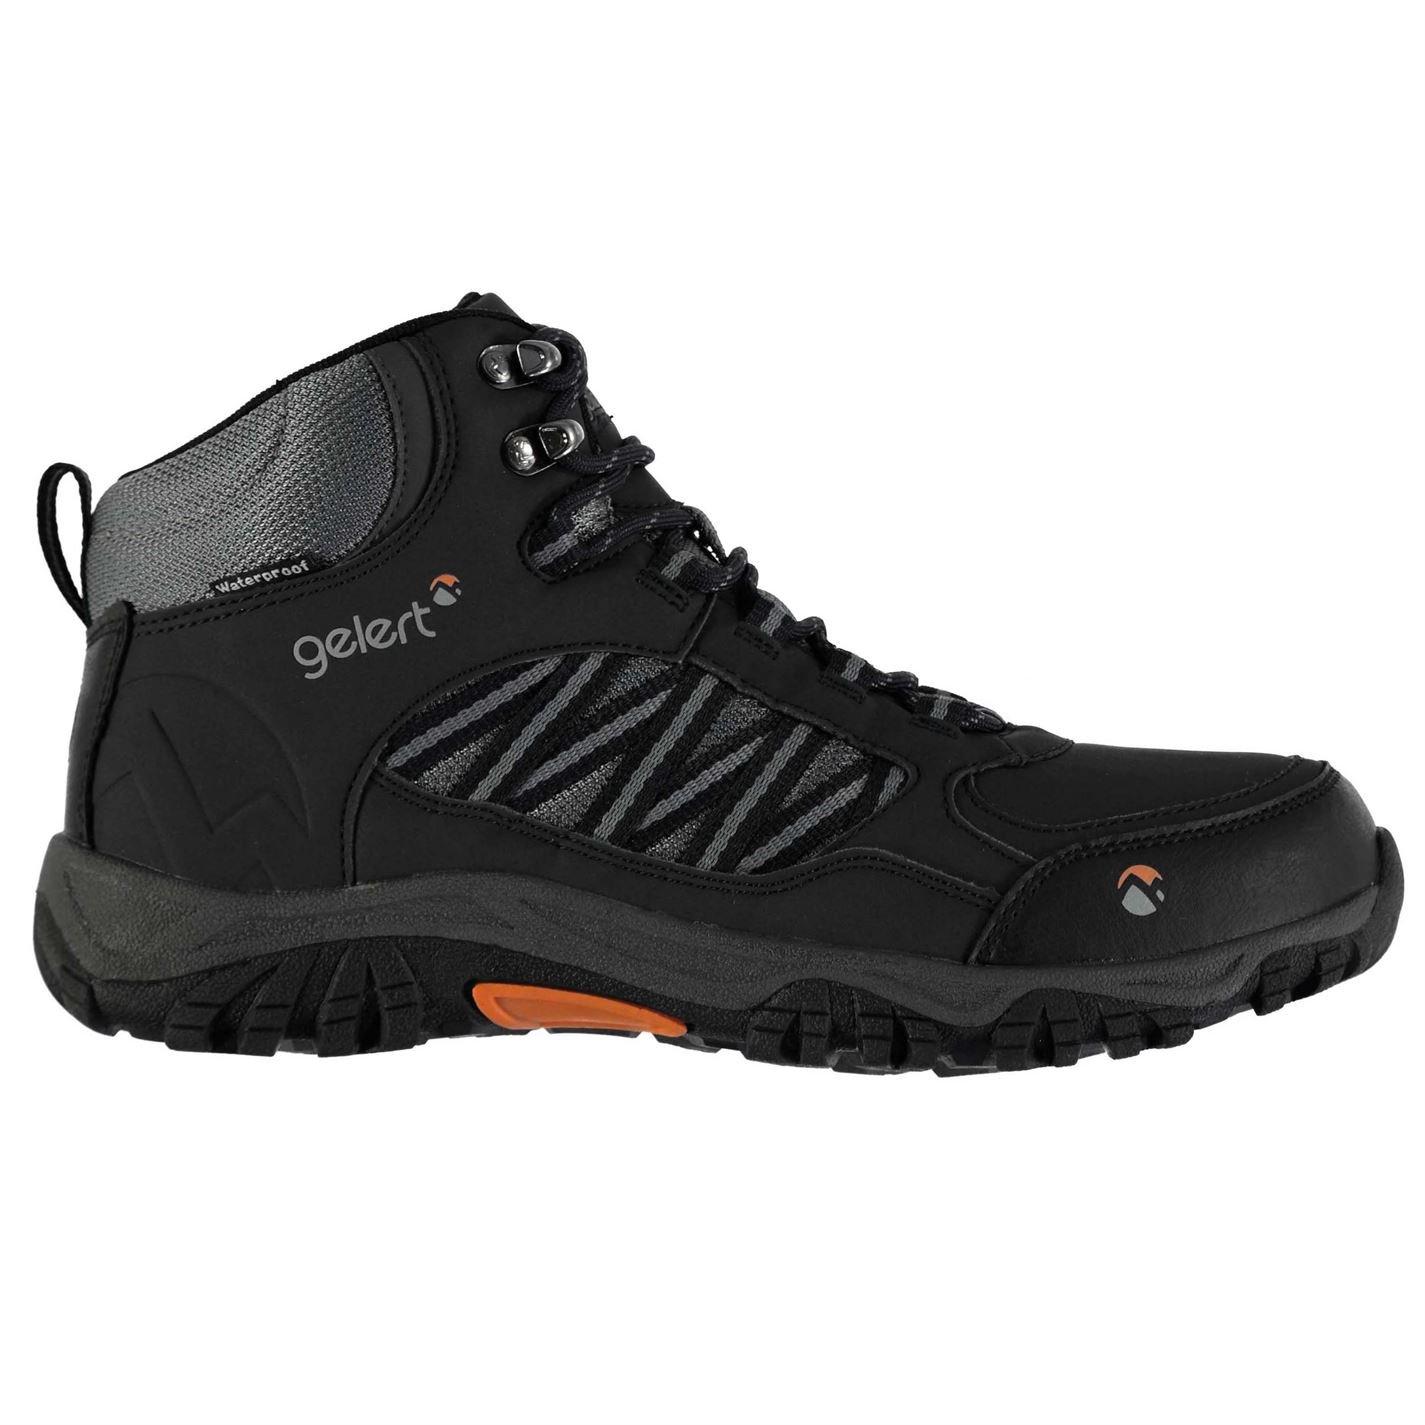 8eeb234b004 Gelert Mens Horizon Waterproof Mid Walking Boots